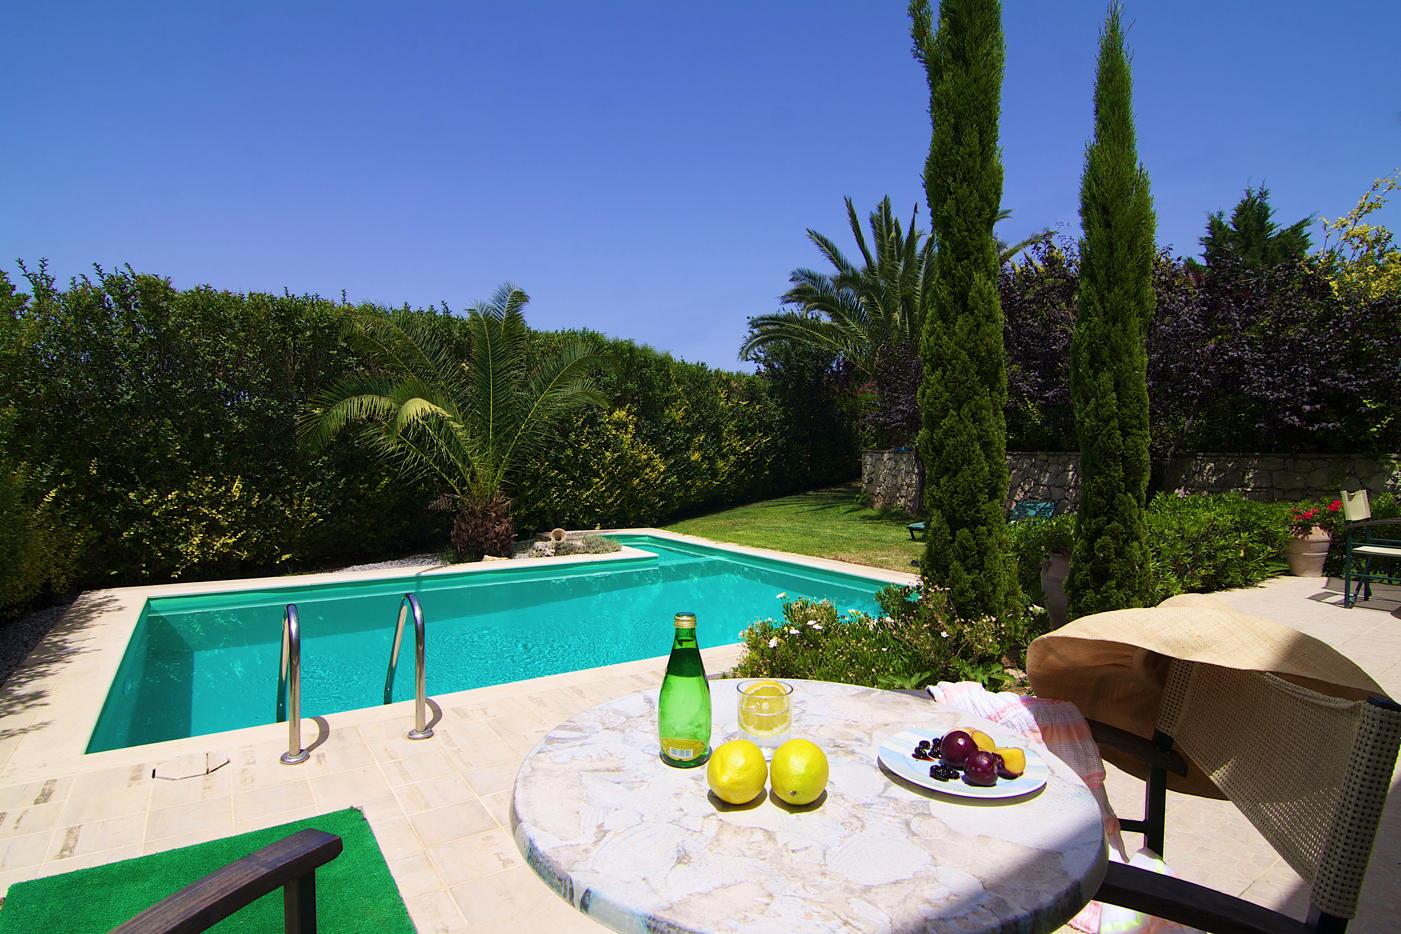 villa aphrodite mit pool und meerblick auf kreta domizile reisen. Black Bedroom Furniture Sets. Home Design Ideas